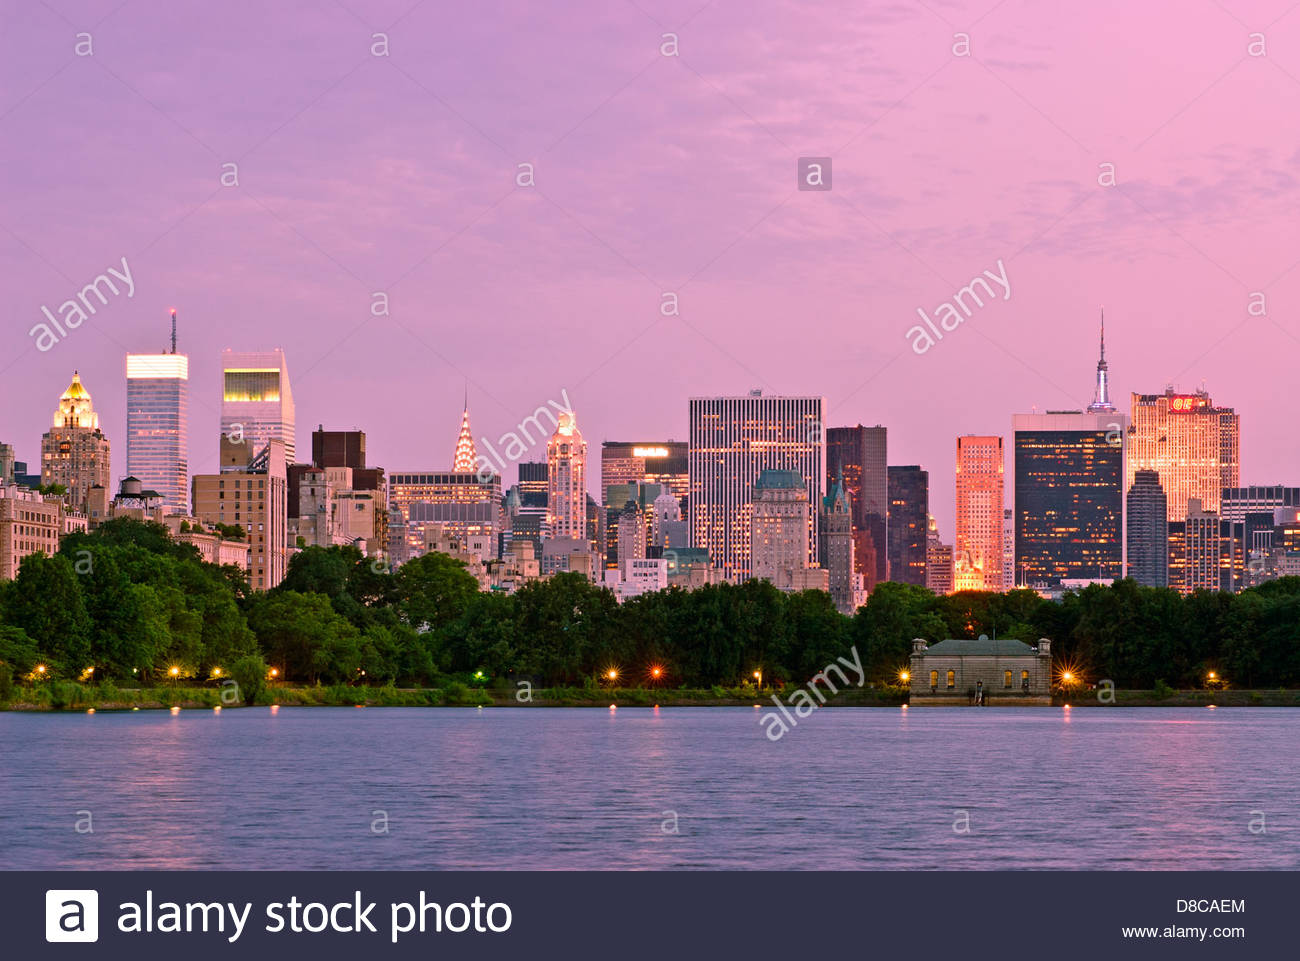 Der Central Park South in Midtown Manhattan Skyline Stockbild